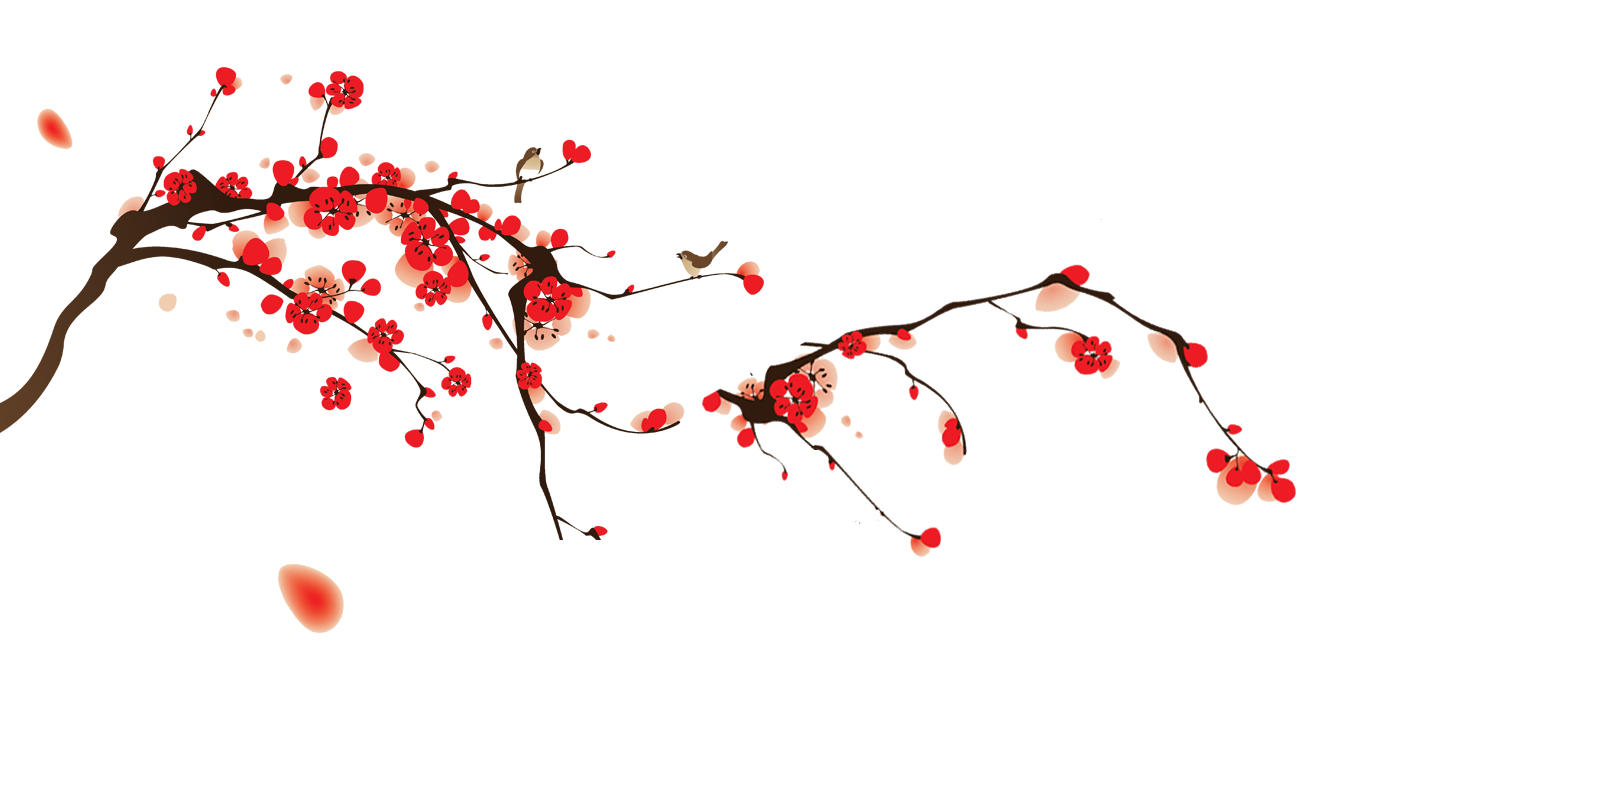 Sxkura.tumblr on Tumblr Transparent Flowers Rose